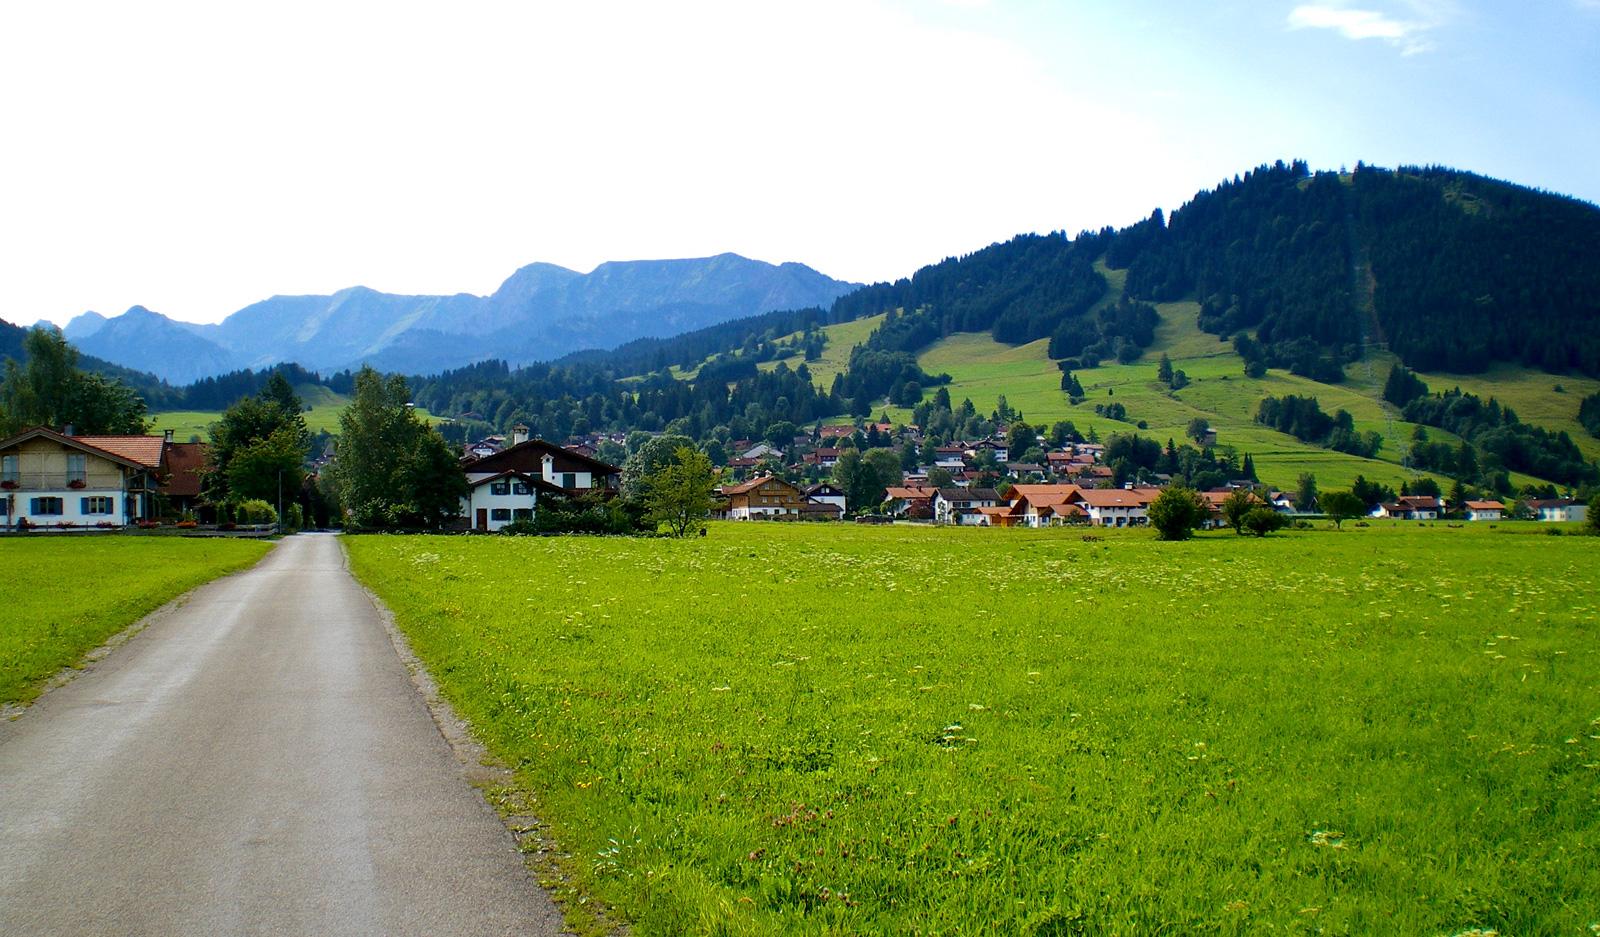 Viaje en bicicleta Carril bici alemania